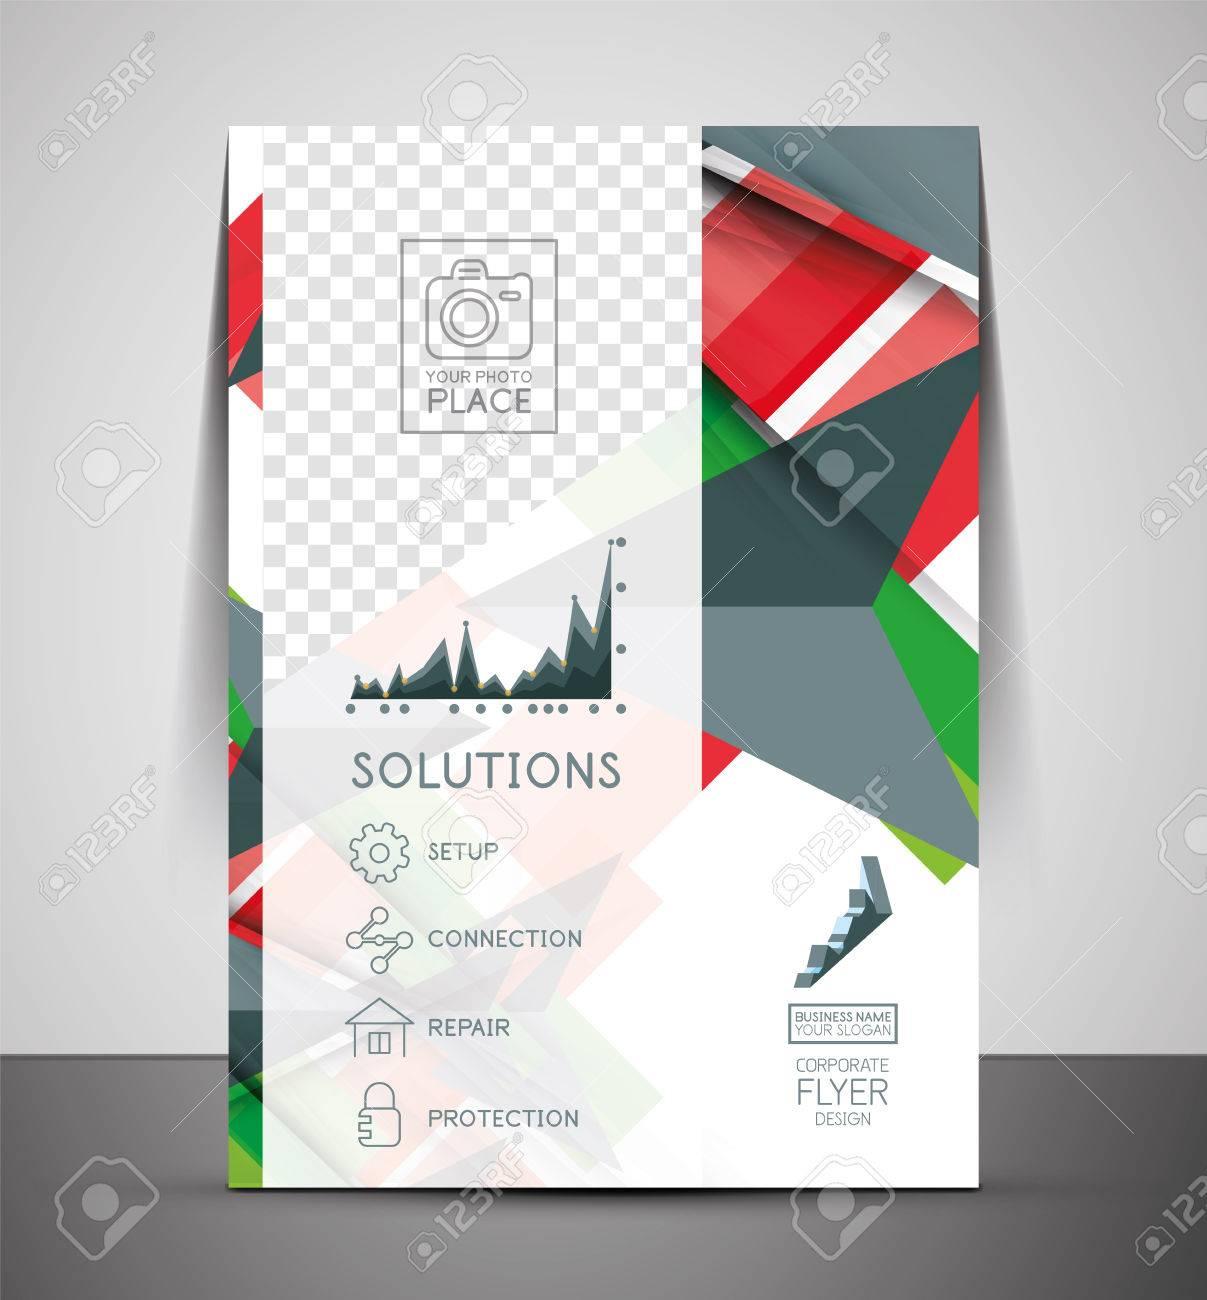 Cmyk Business Corporate Flyer Template Geometrical Design Royalty